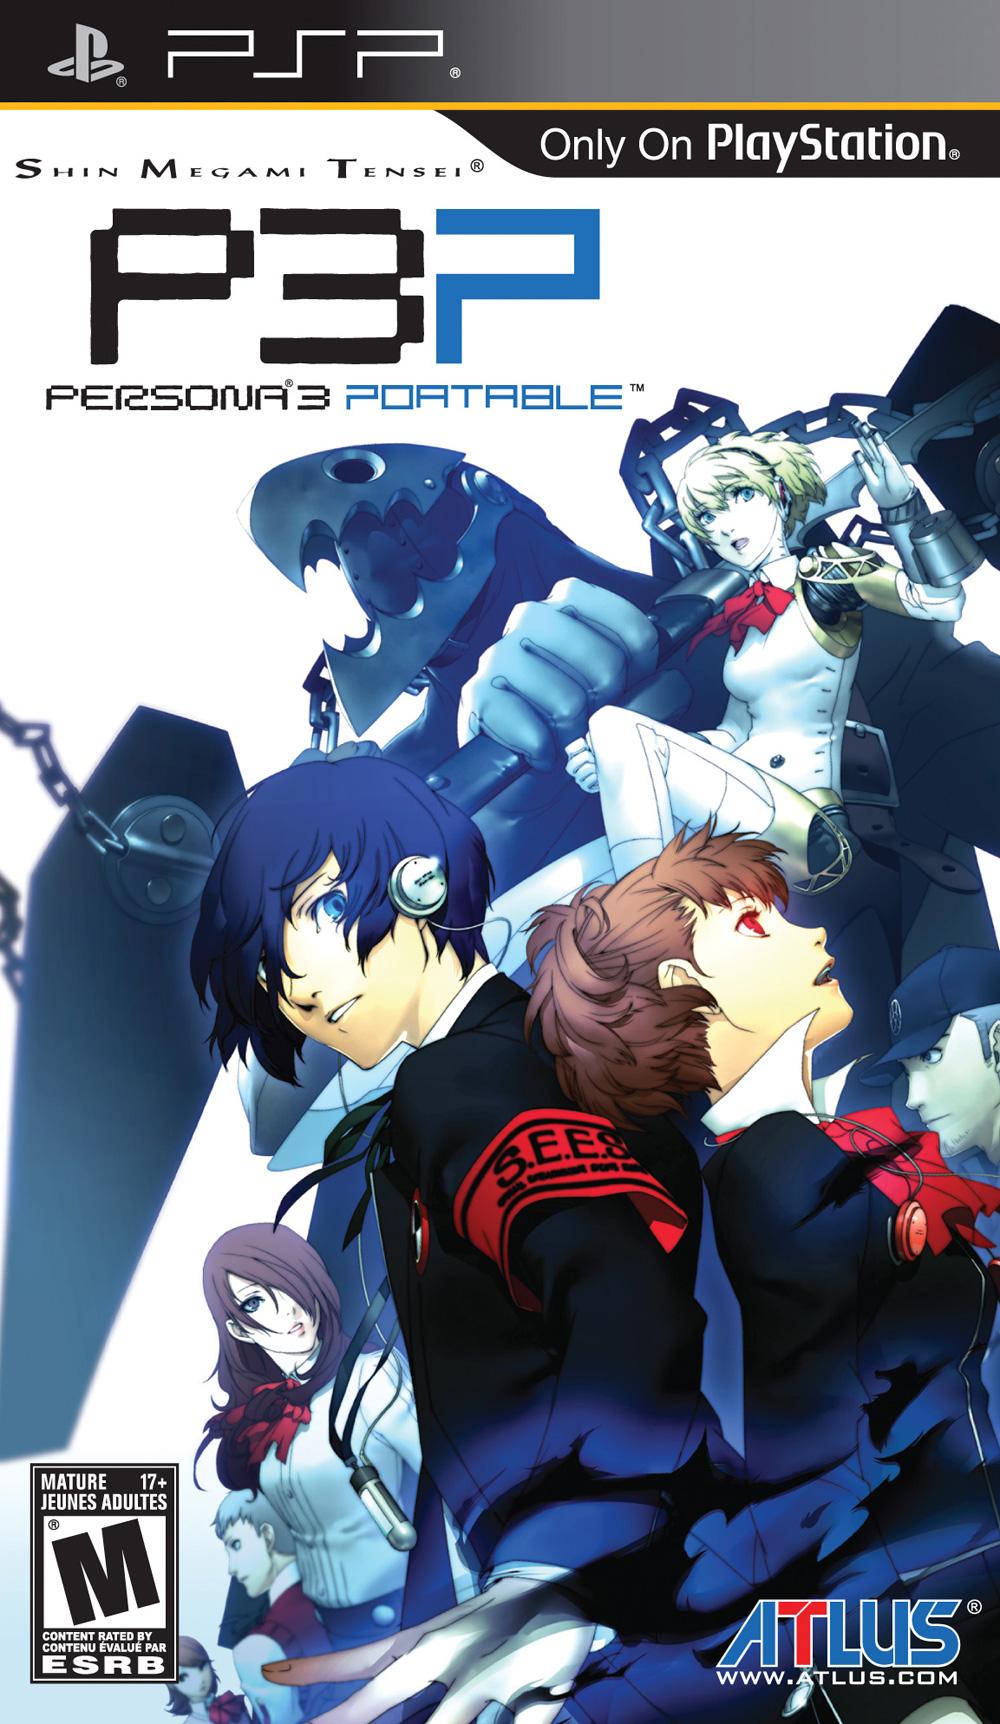 Juegos PSP : Imprescindibles,Recomendaciones,Etc - Página 3 158550-Shin_Megami_Tensei_-_Persona_3_Portable_(USA)-10